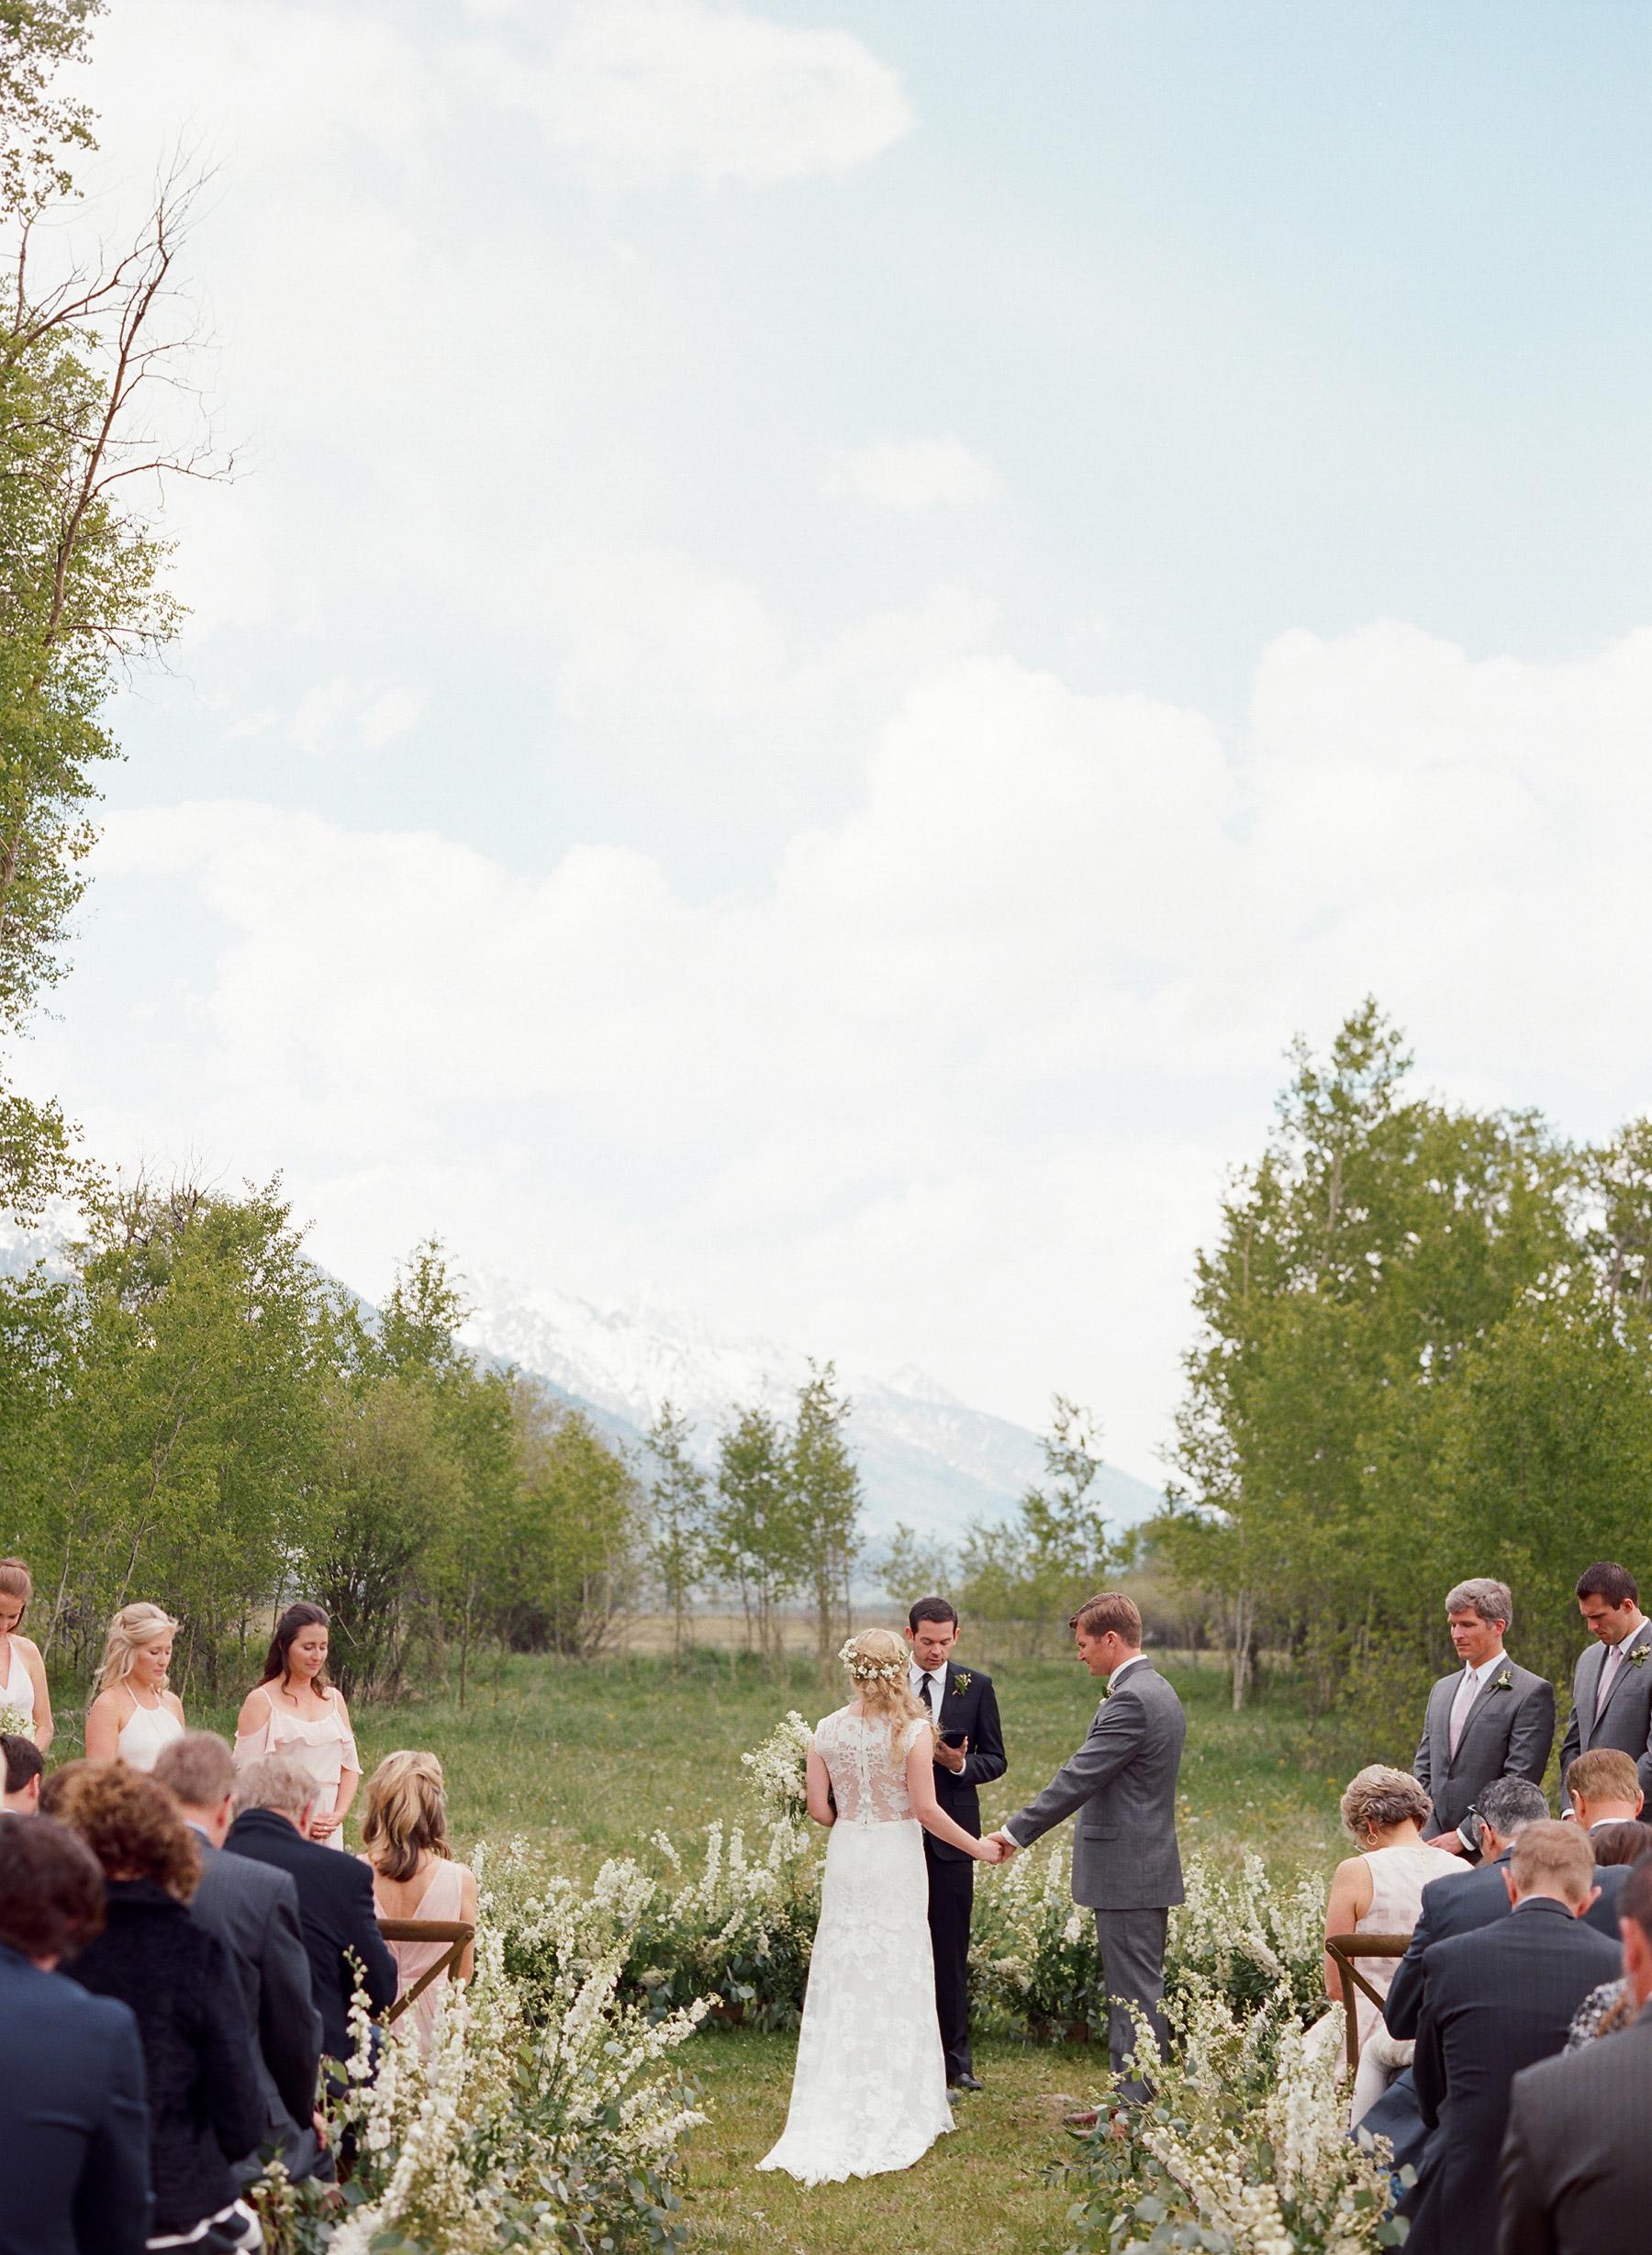 Colby John Wedding ceremony